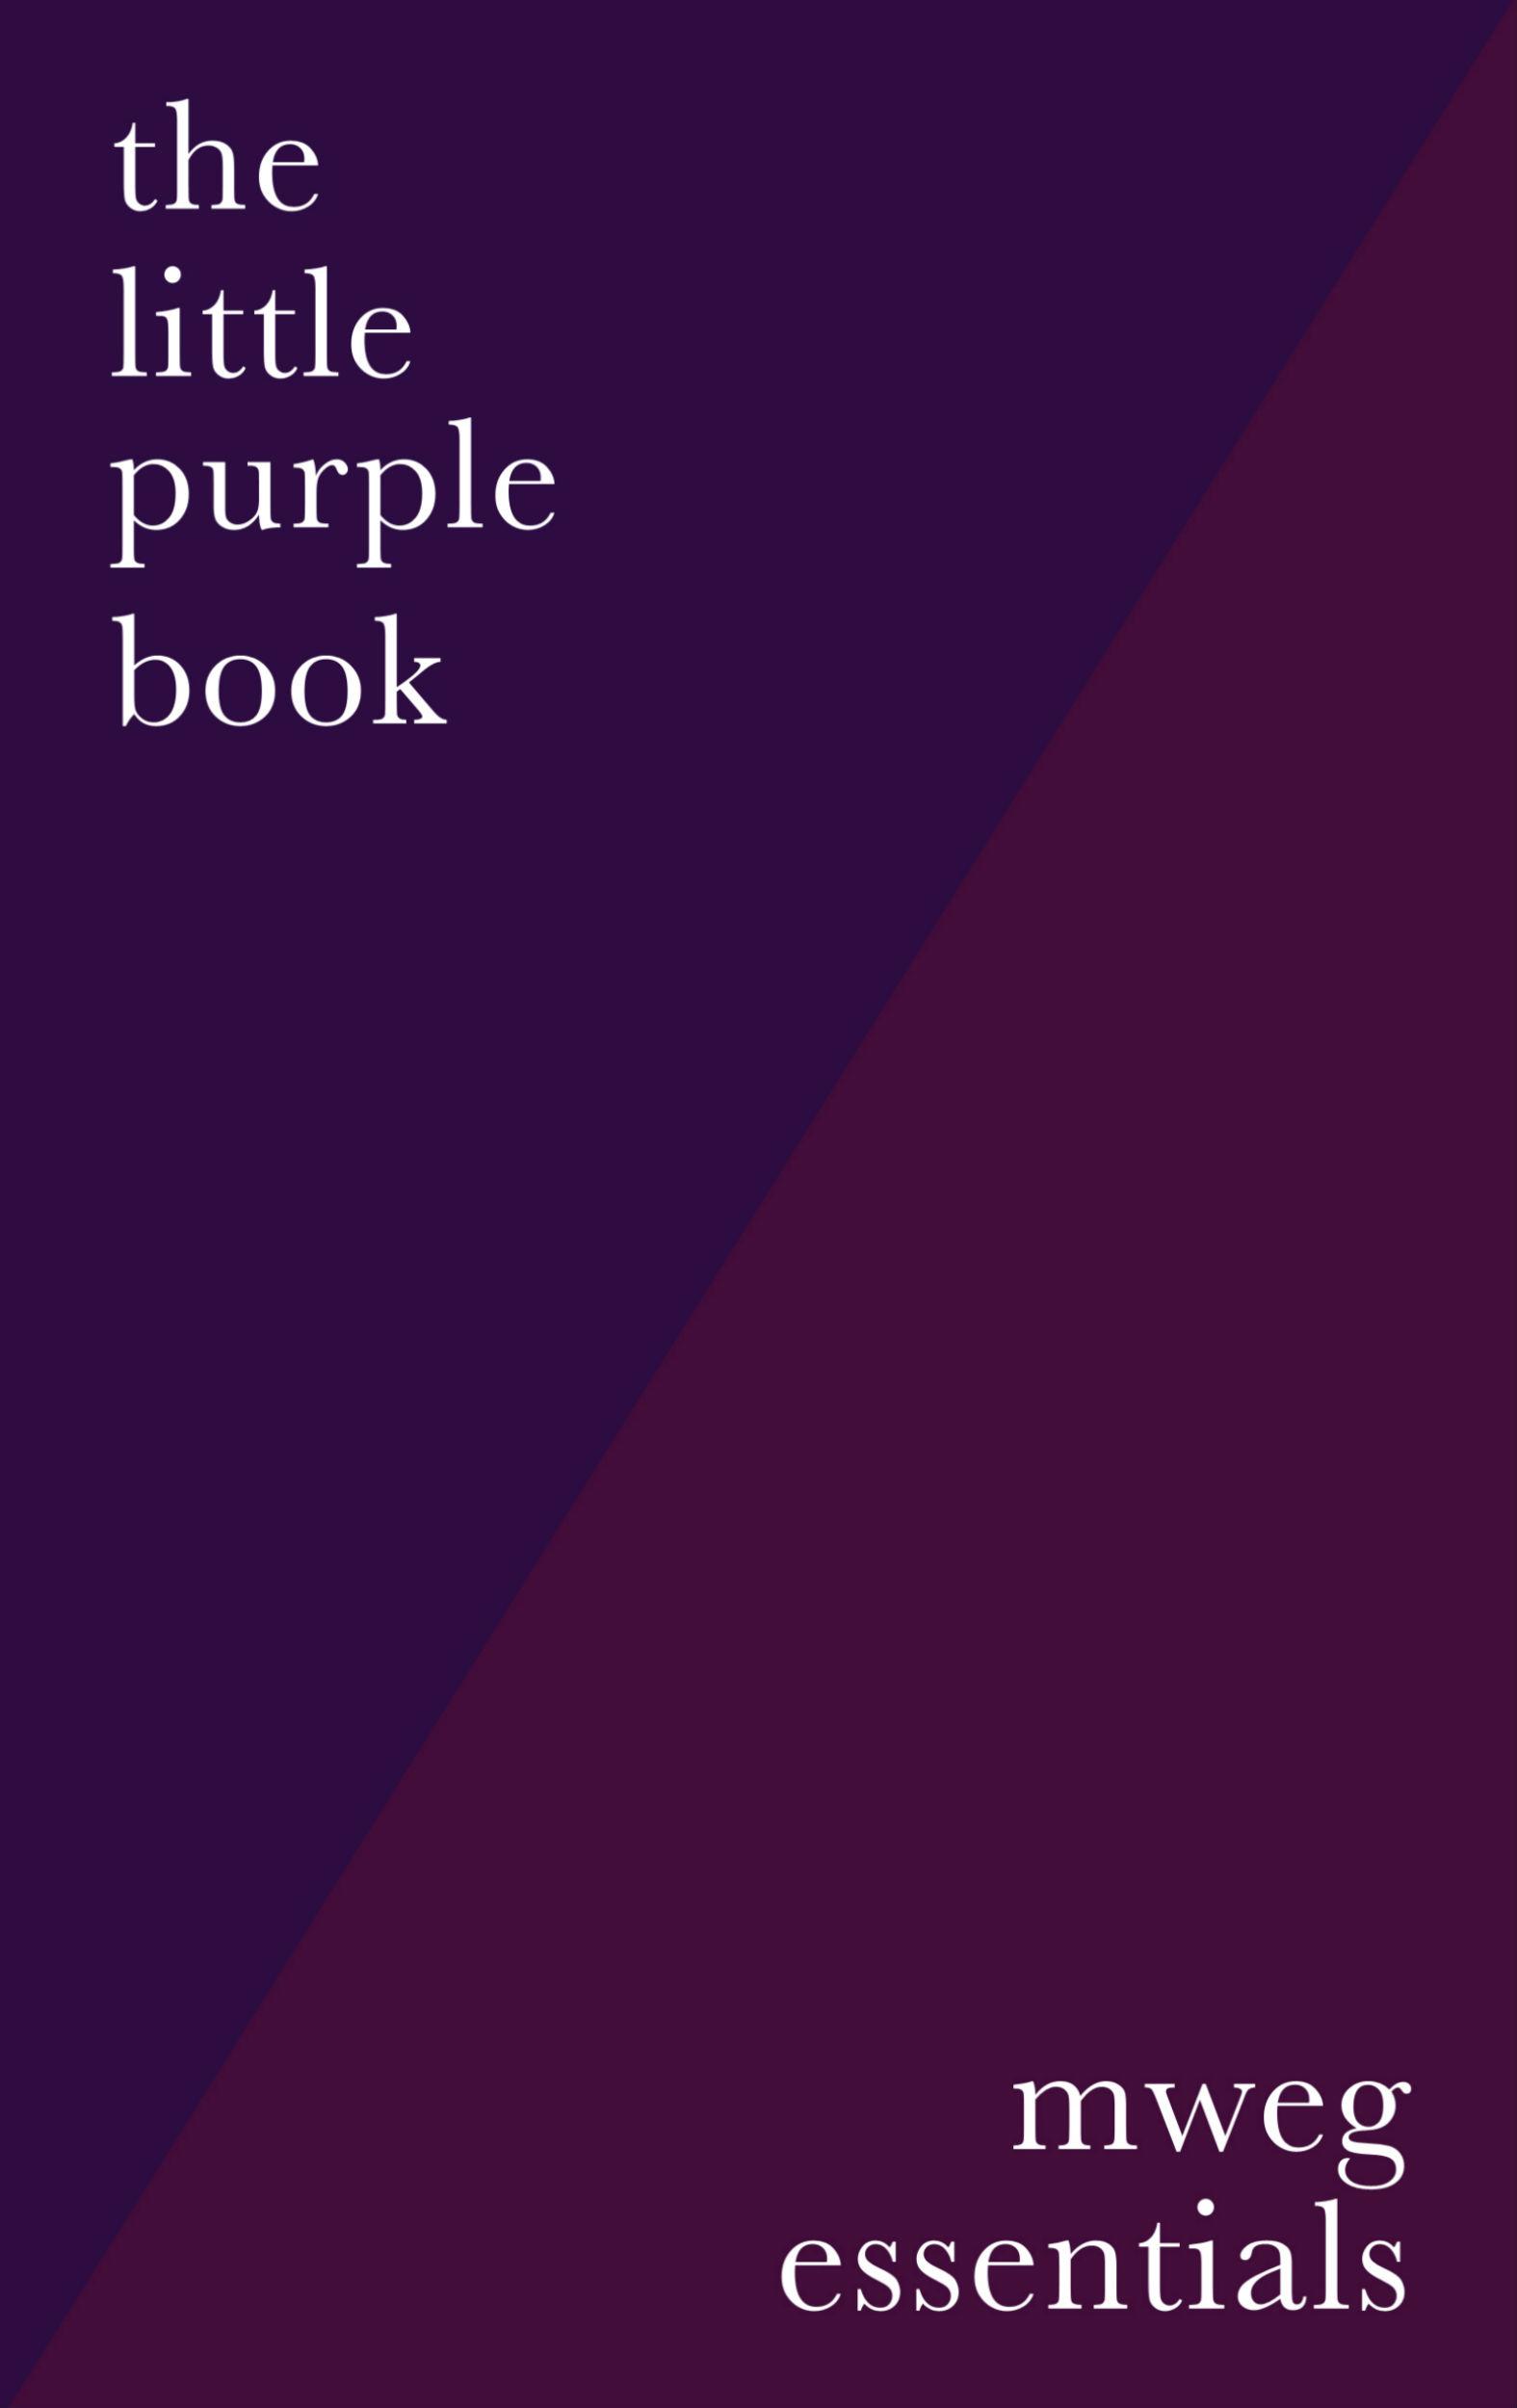 LittlePurpleBook-1575.jpg